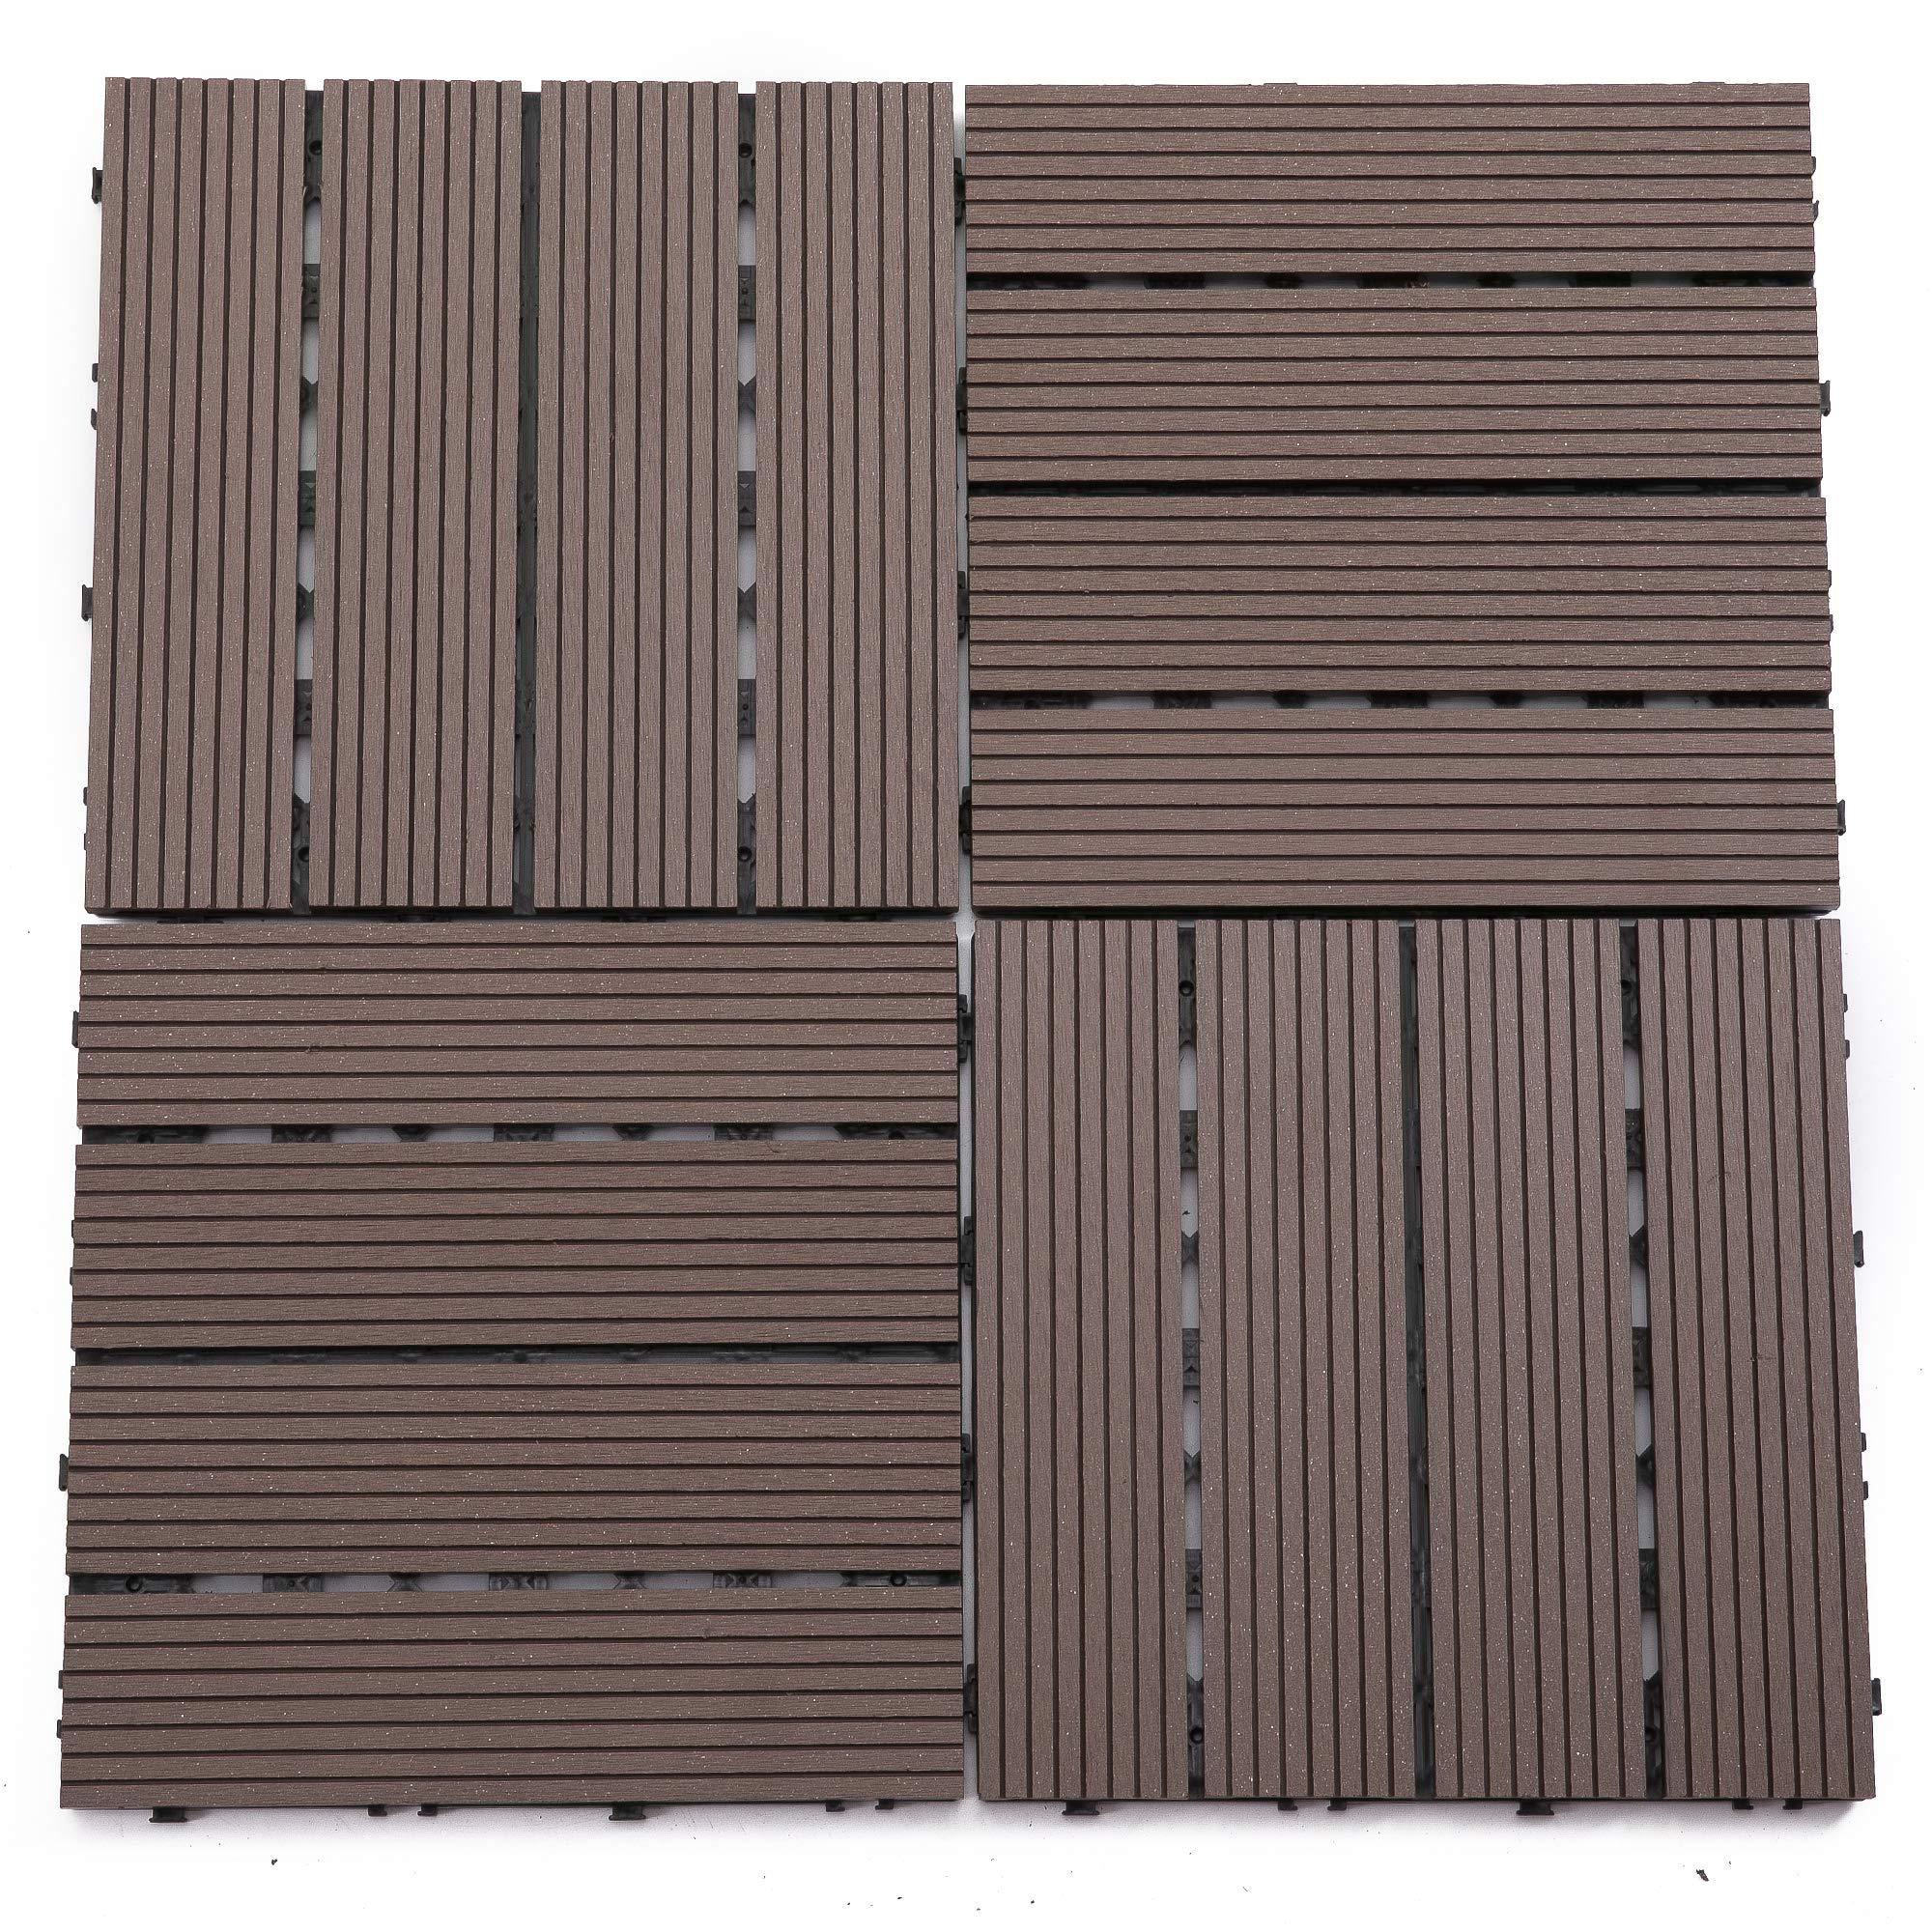 Samincom (22 Pieces) Deck Tiles Interlocking Wood-Plastic Composites Patio Pavers, One Pack Coffee